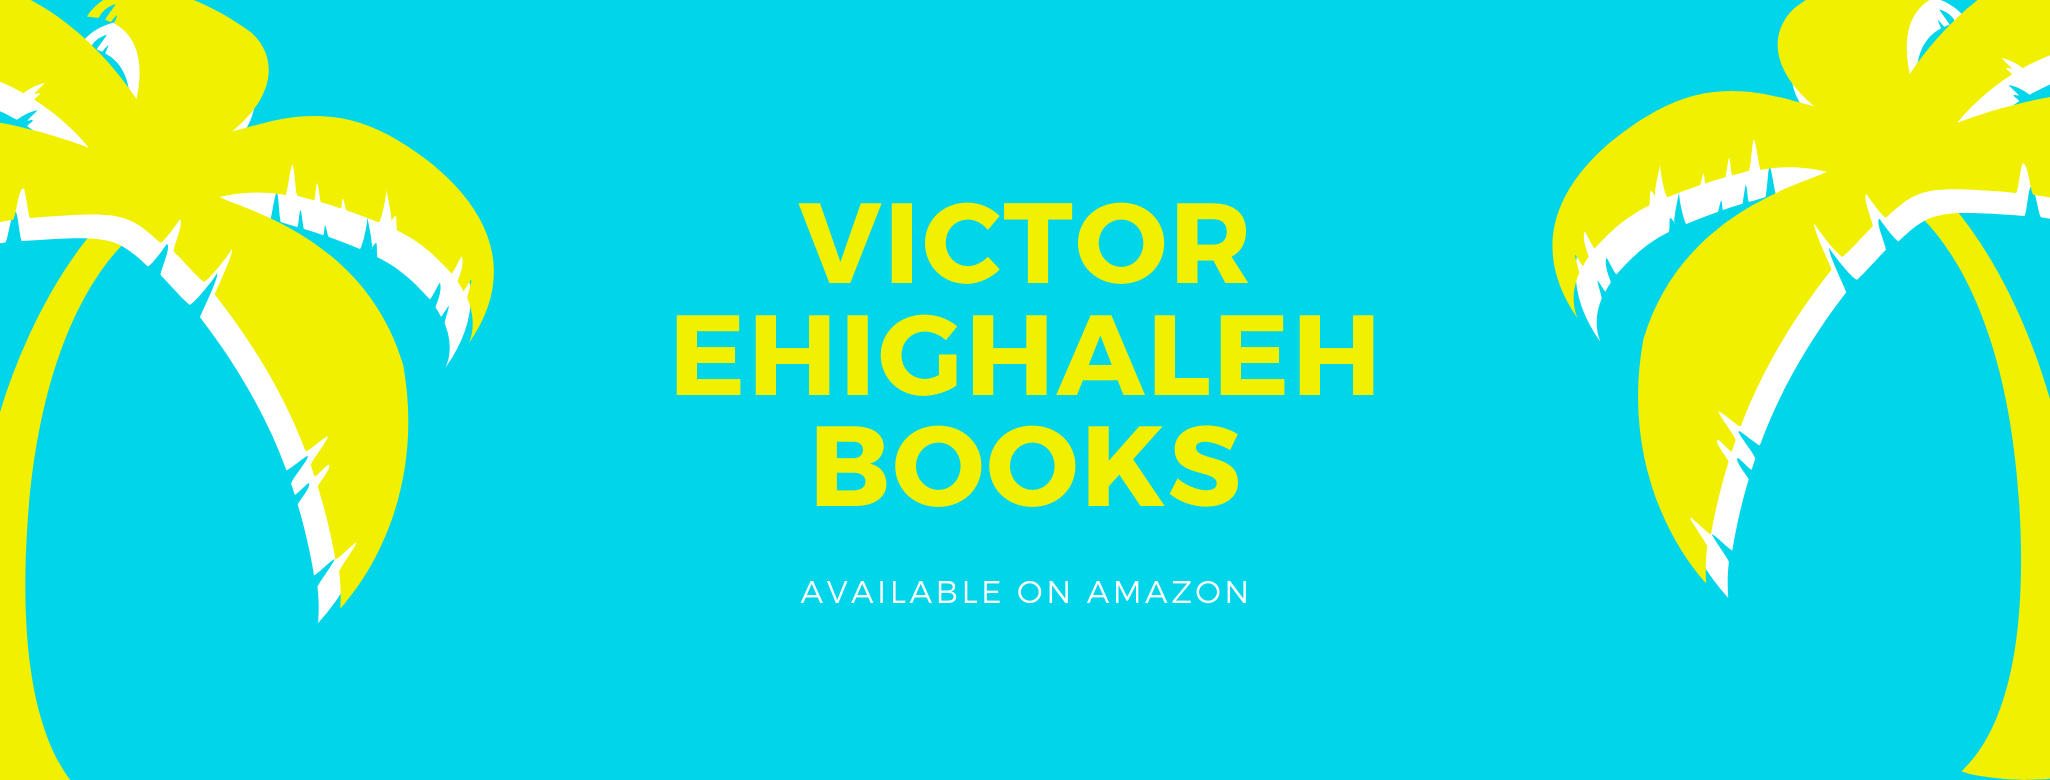 Victor Ehighaleh